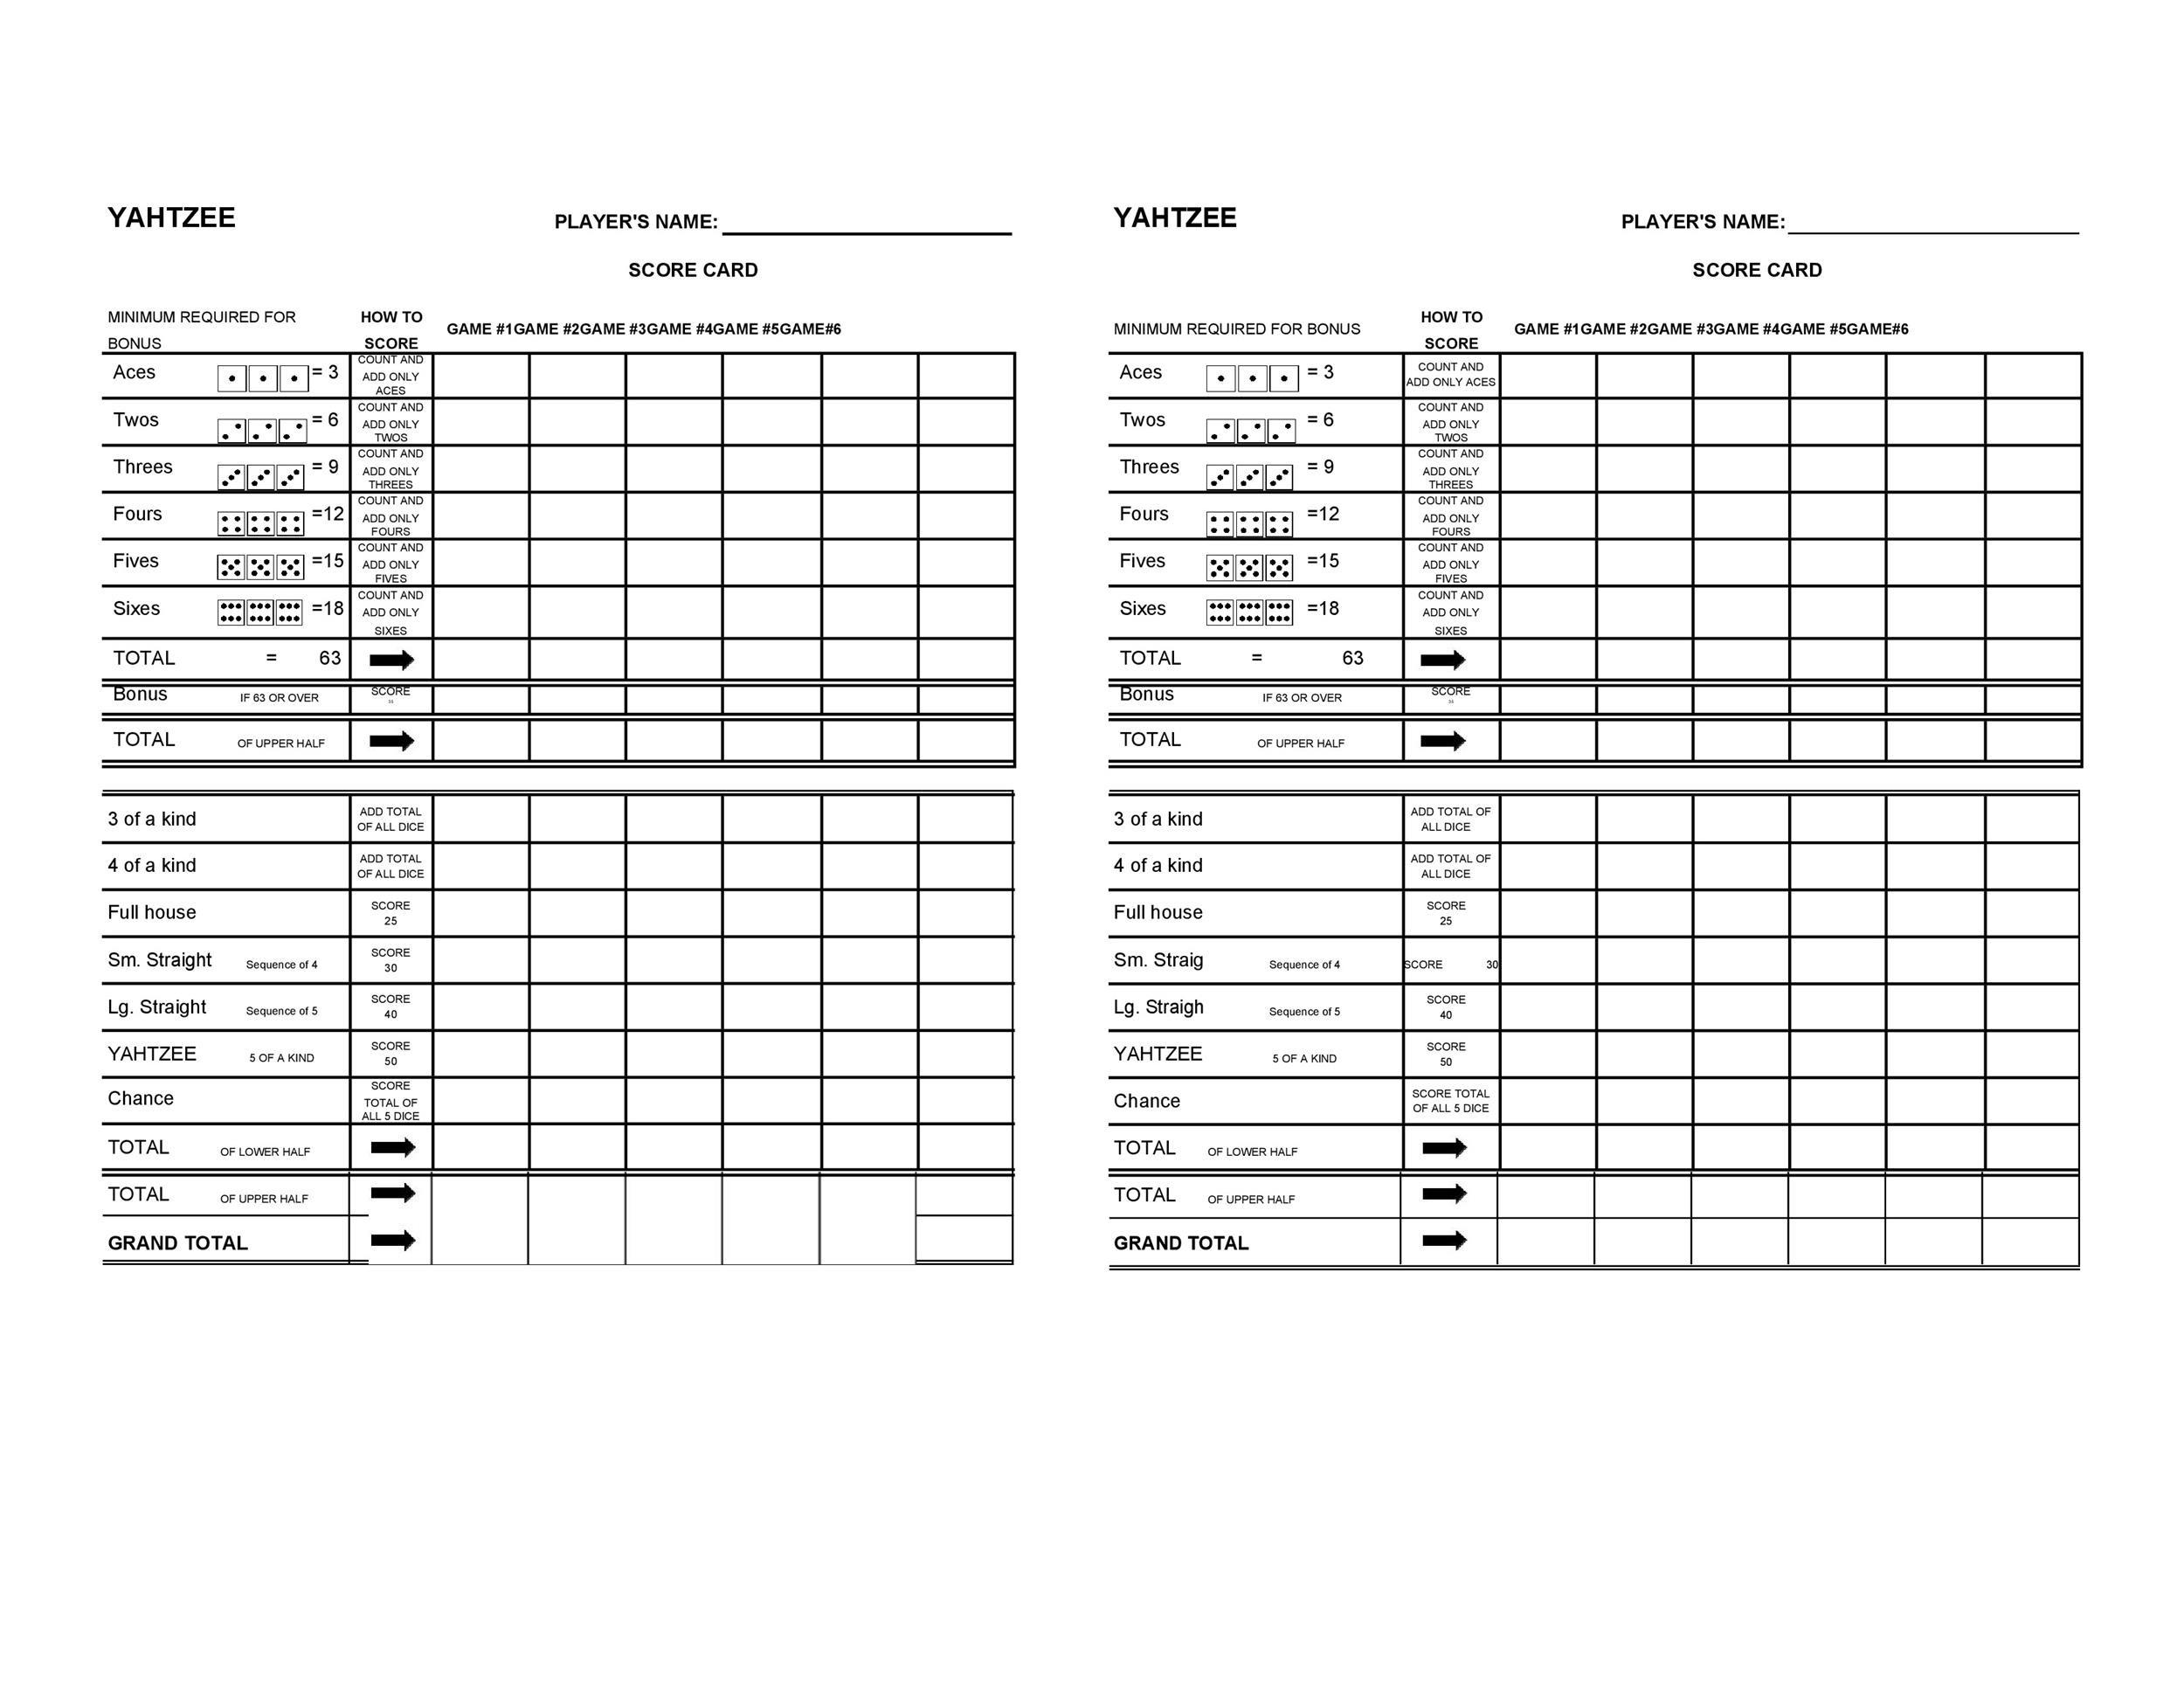 Free Yahtzee Score Sheets 04